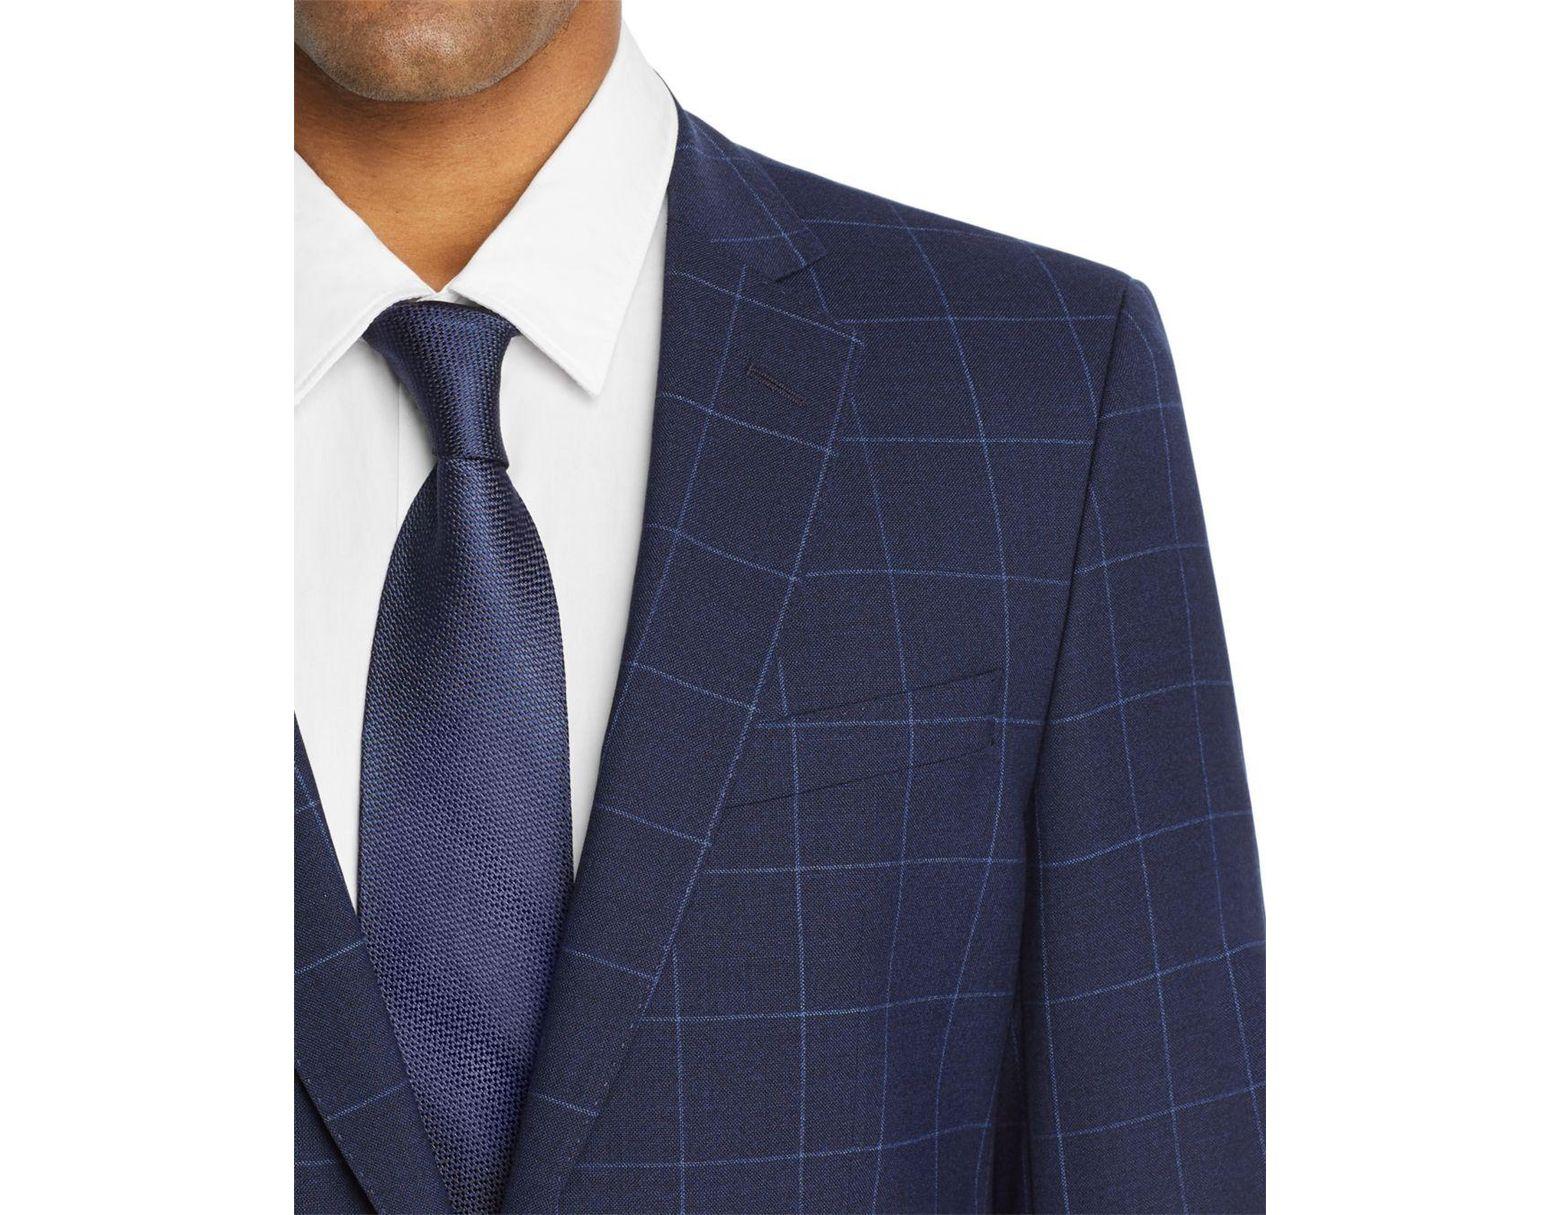 6afc64b7 BOSS Boss Huge/genius Windowpane Slim Fit Suit in Blue for Men - Lyst